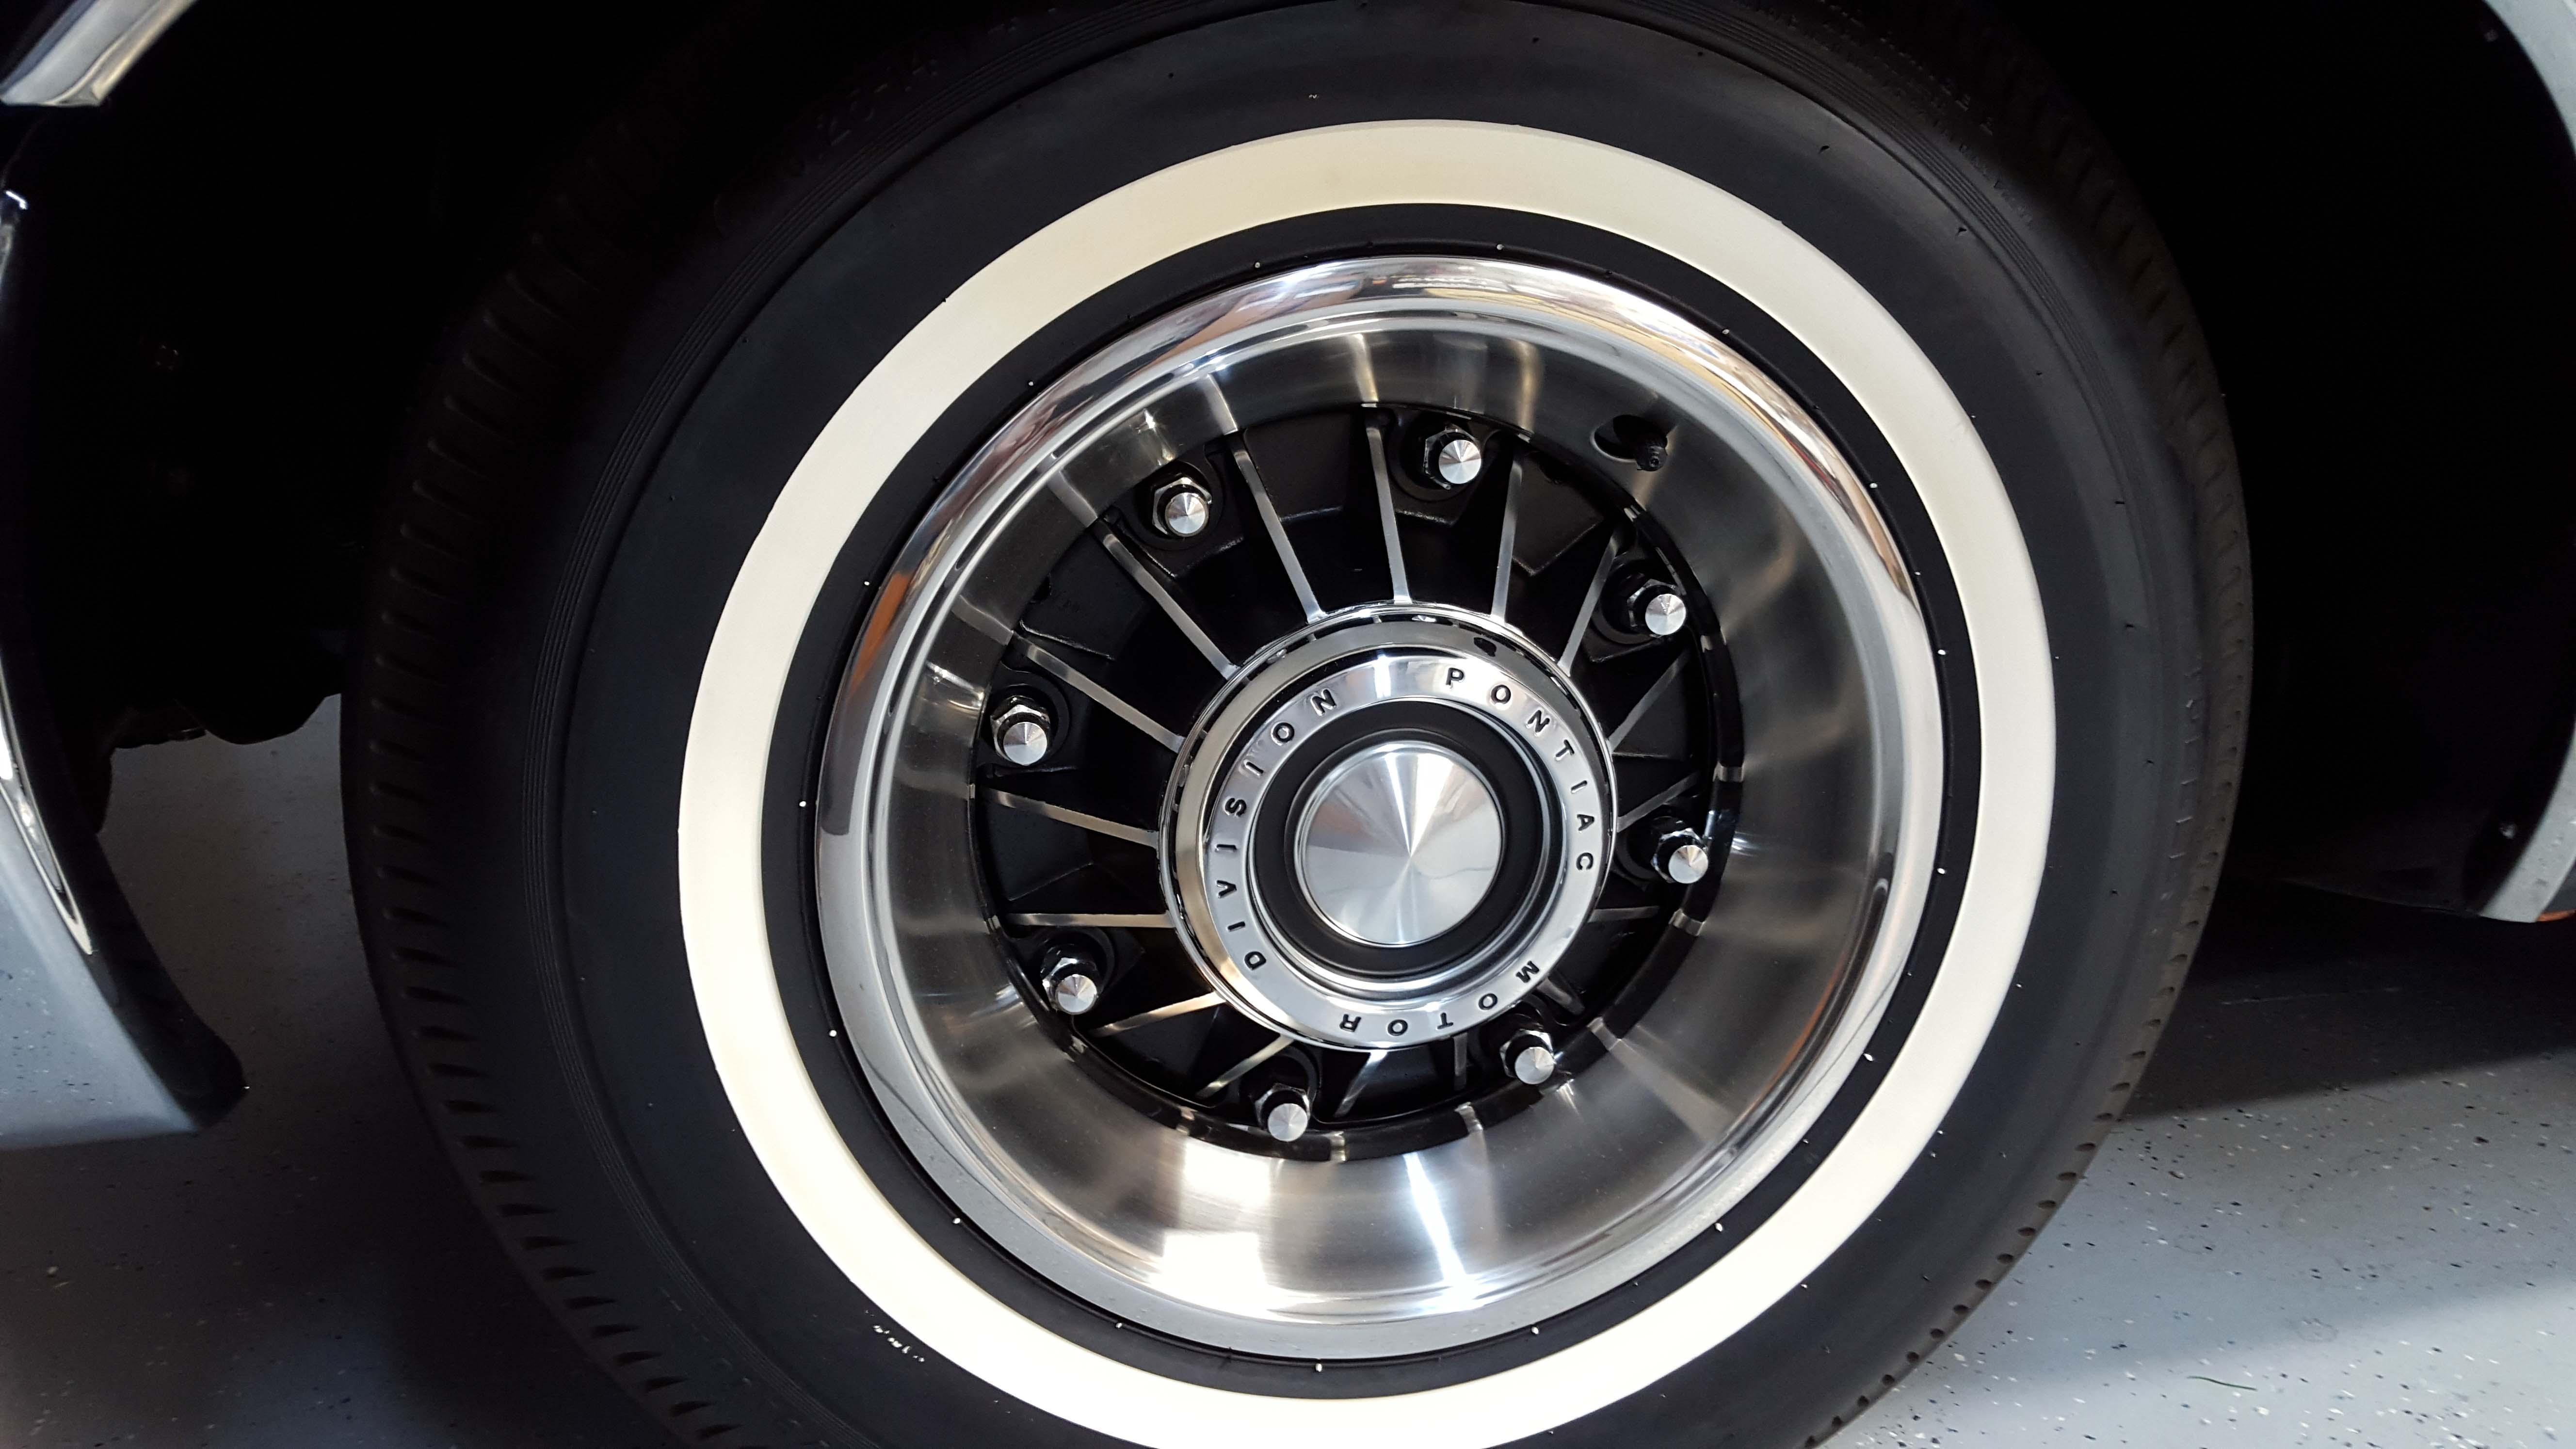 Pontiac's beautiful 8-lug wheel was optional on the 2+2.